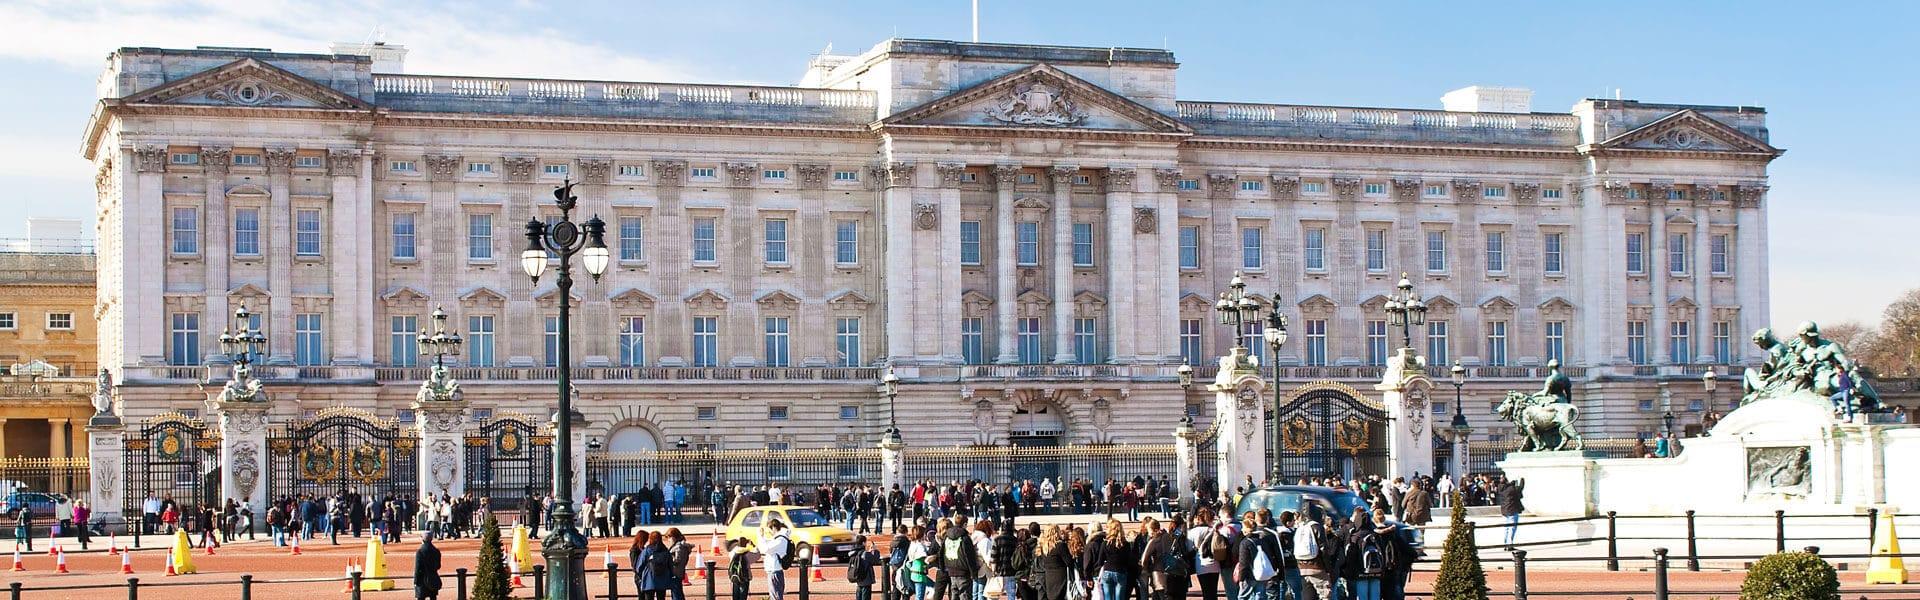 Den Buckingham Palast aus nächster Nähe sehen bei einer Betriebsfahrt in London